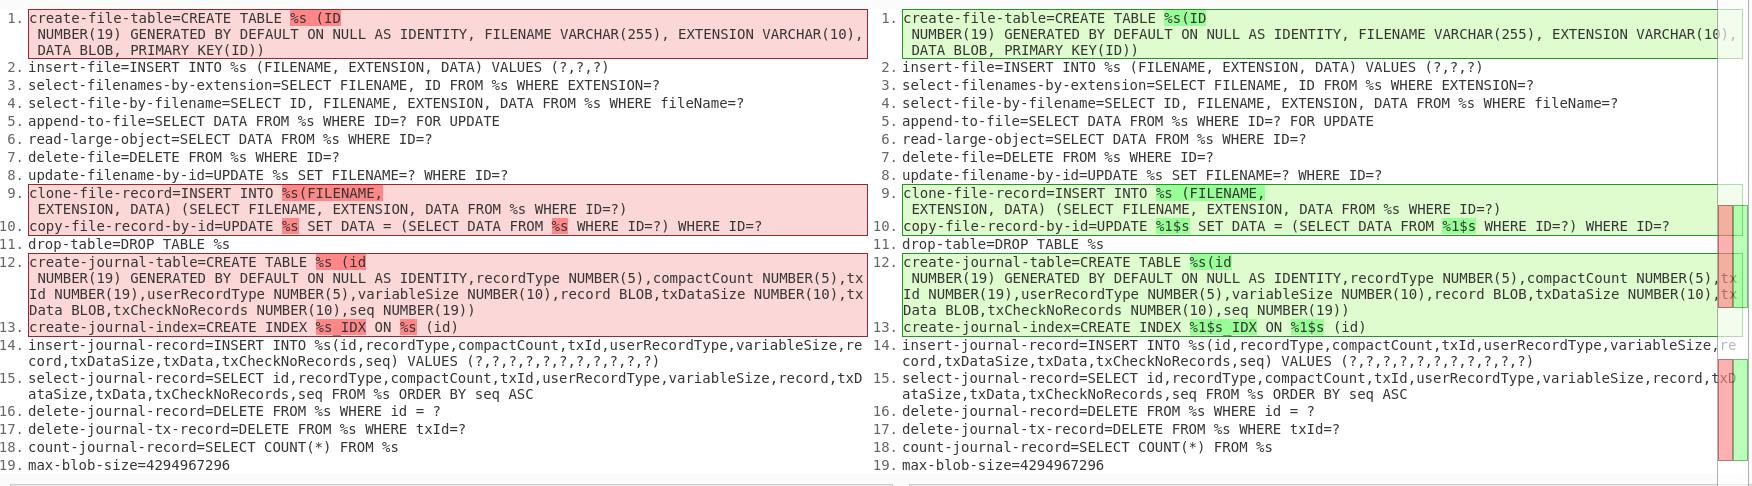 WFLY-10392] Regression in Remote JCA scenario with JDBC